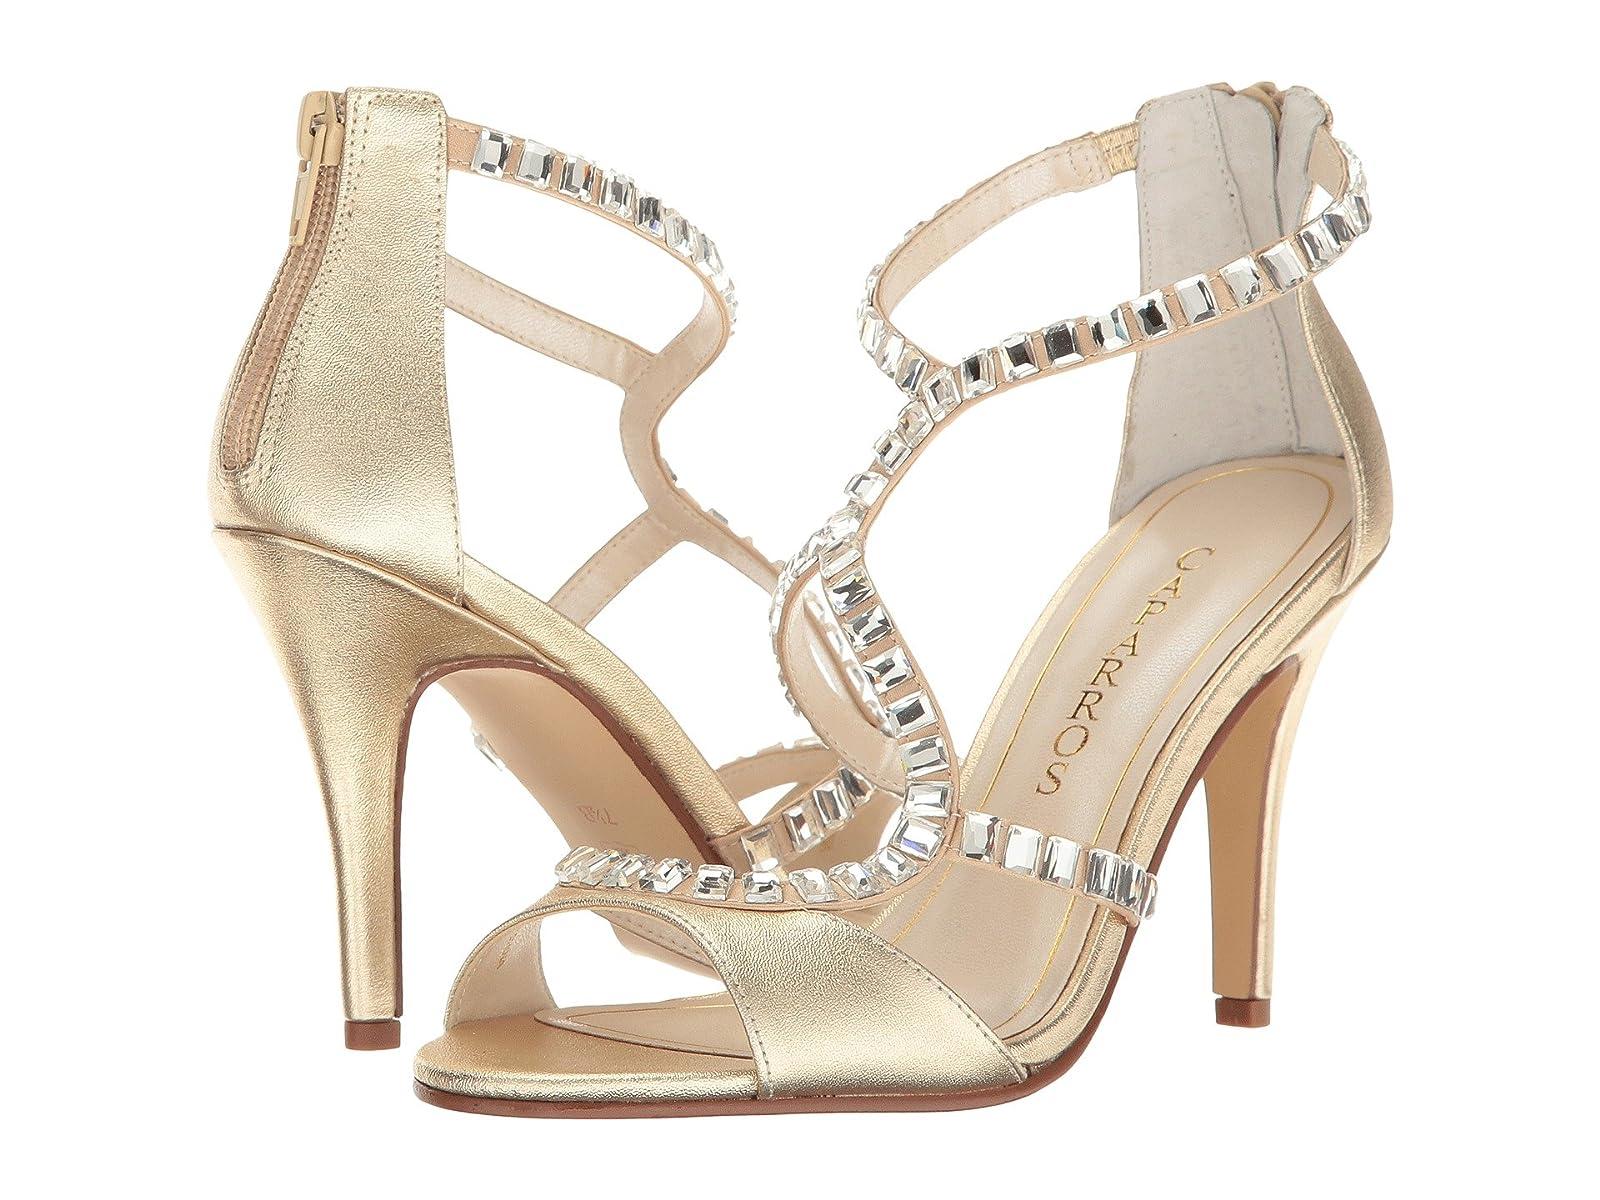 Caparros IdaliaCheap and distinctive eye-catching shoes